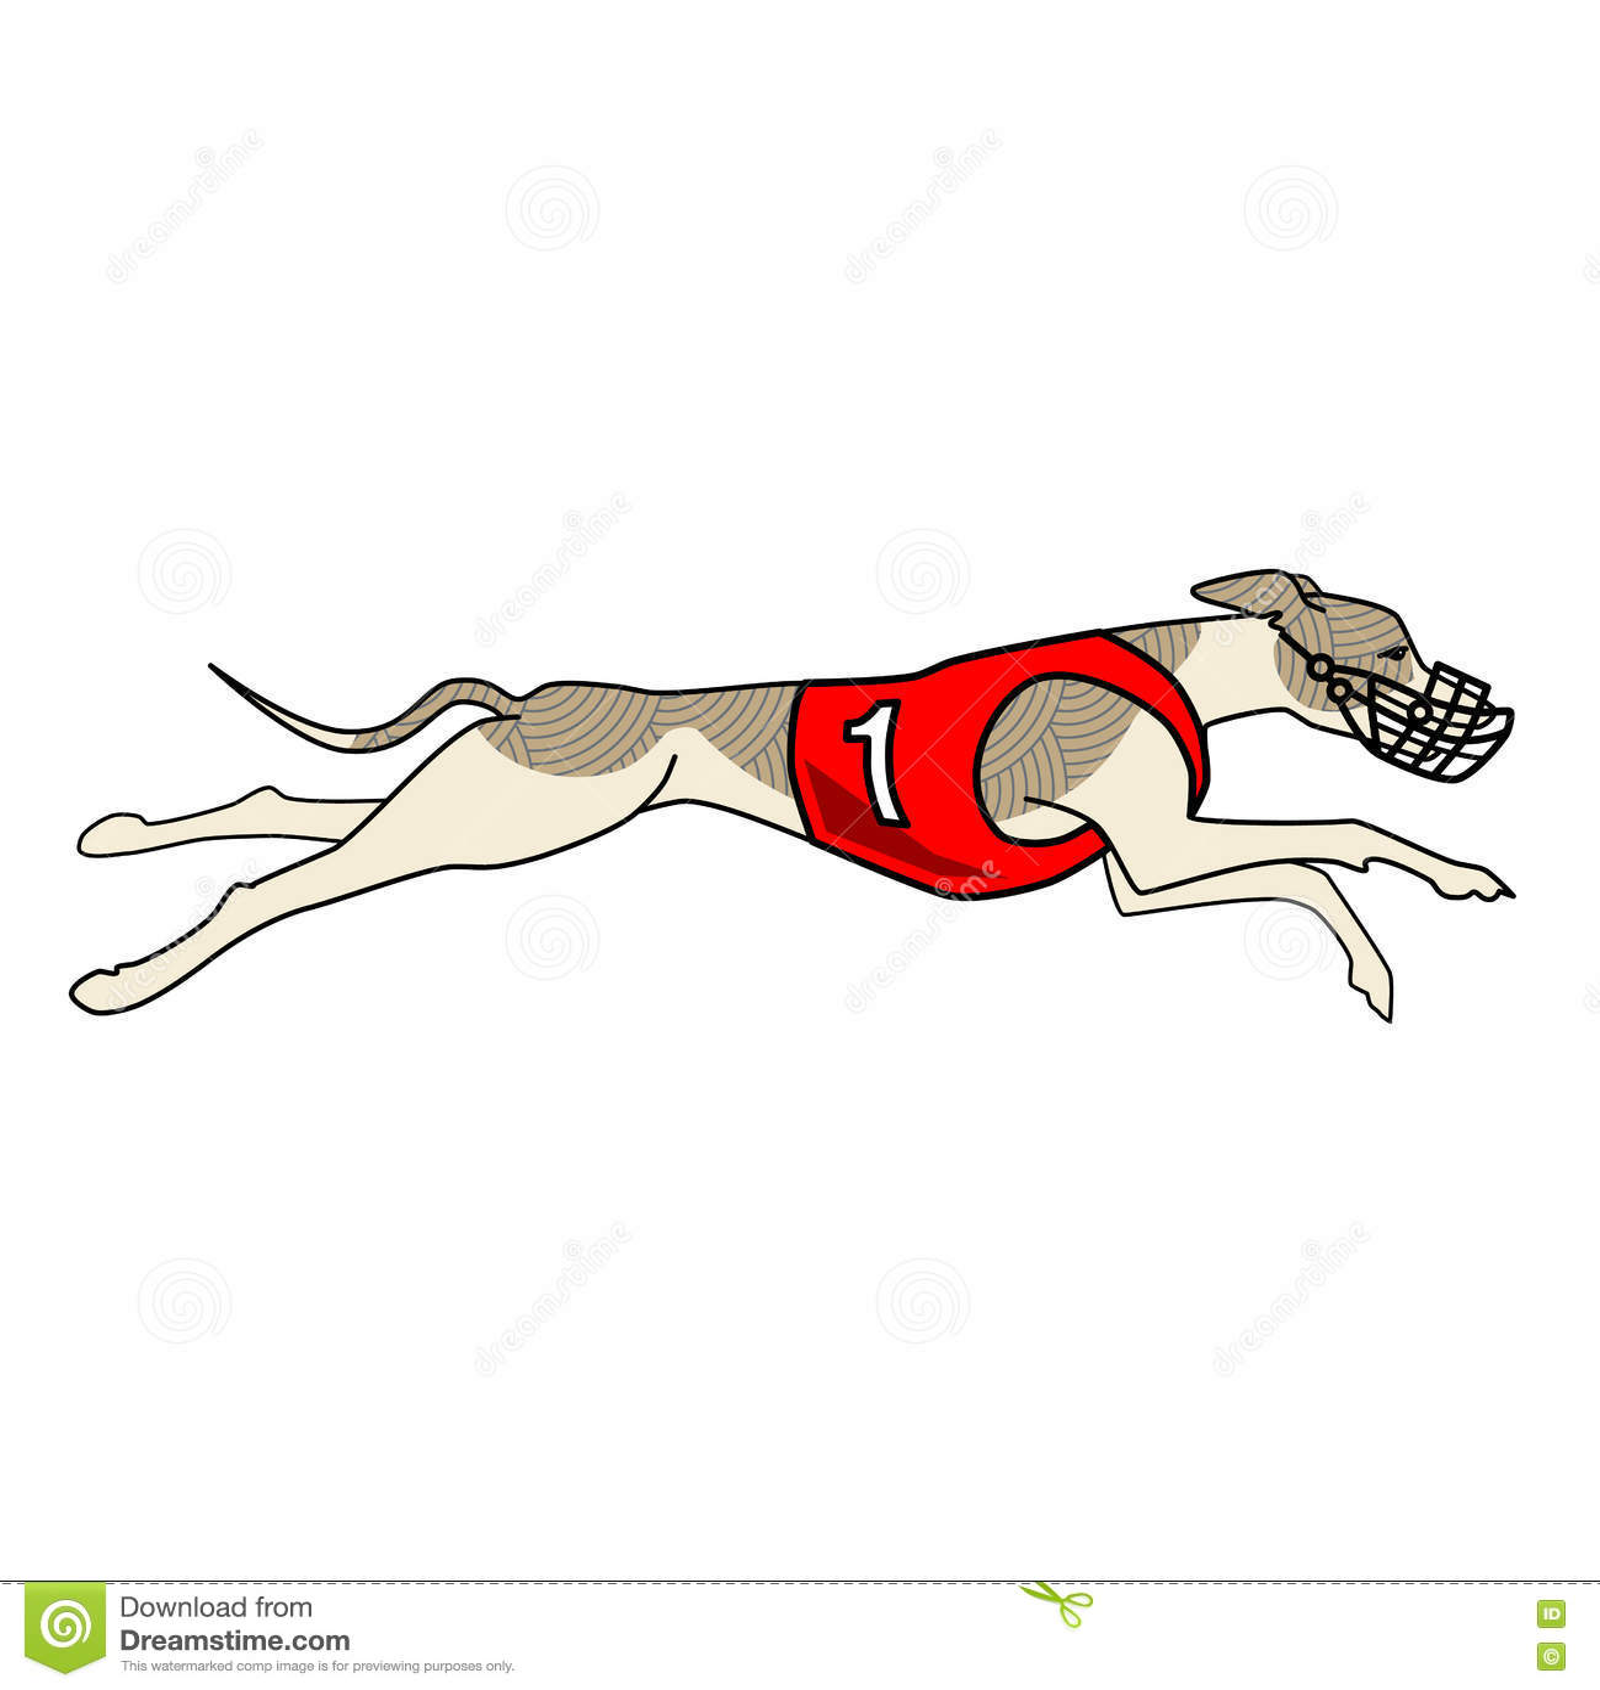 b42452ce7a8b6 Running Dog Whippet Breed